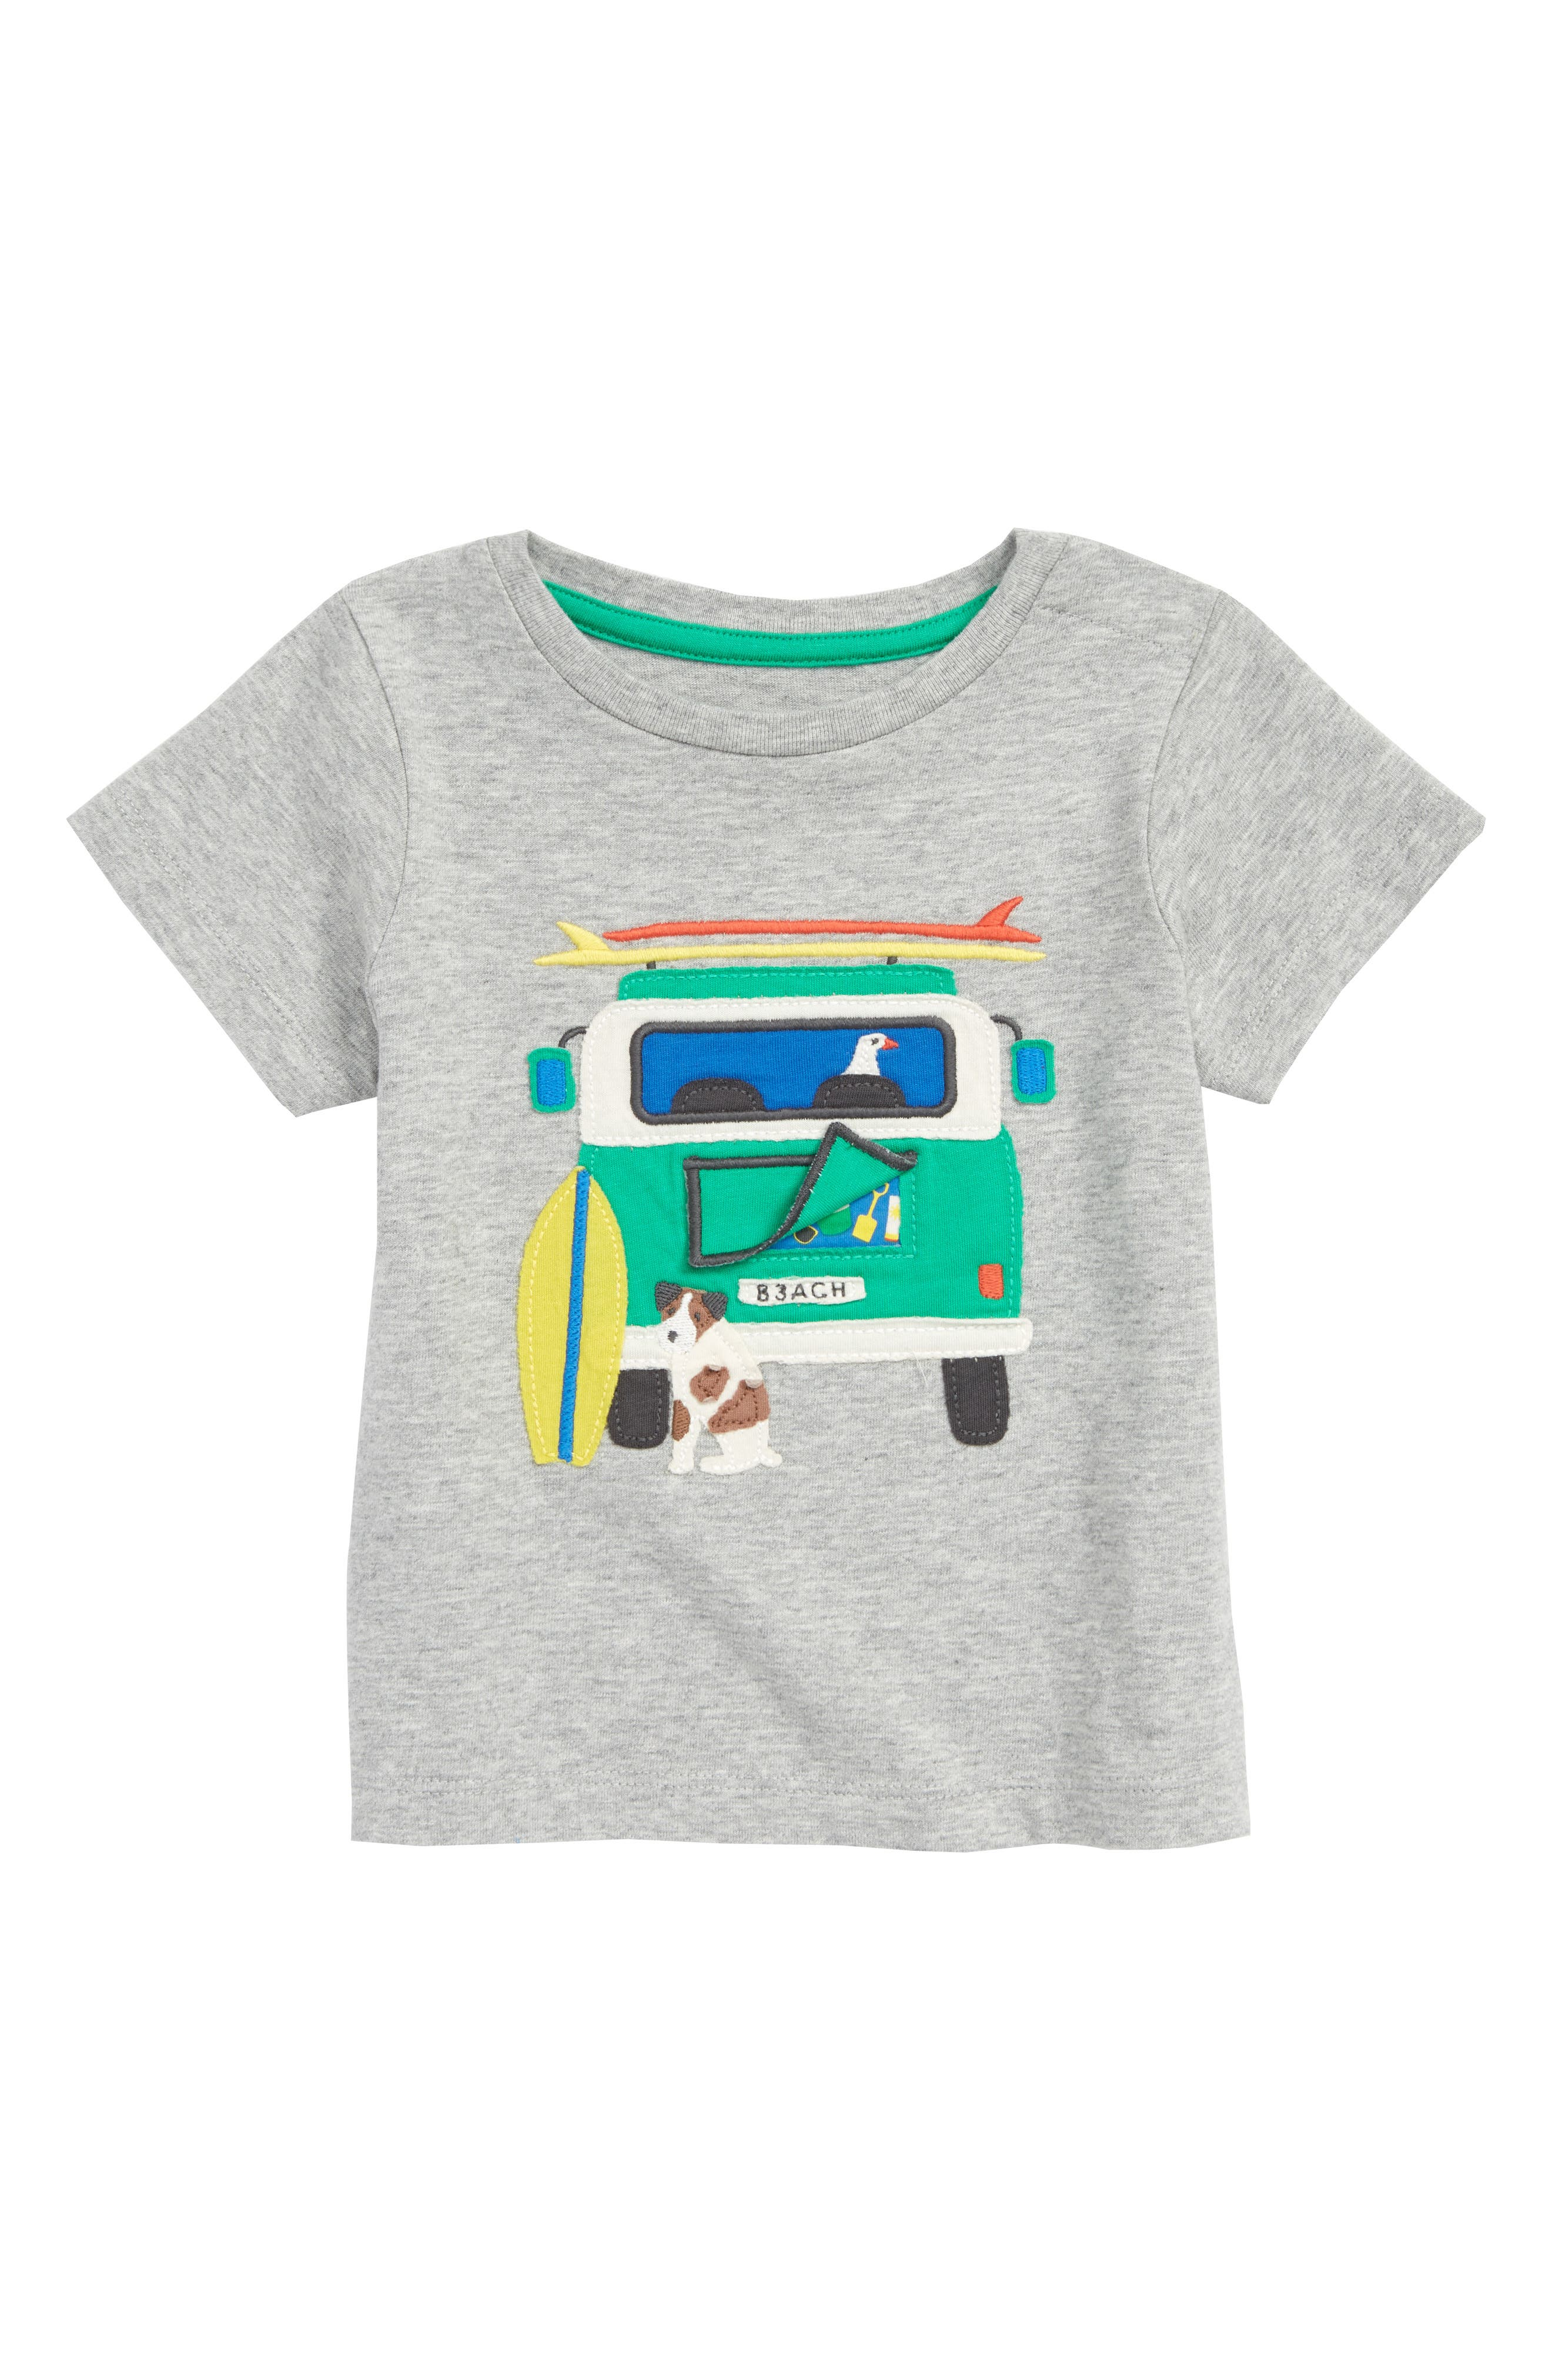 Peekaboo T-Shirt,                             Main thumbnail 1, color,                             Grey Marl